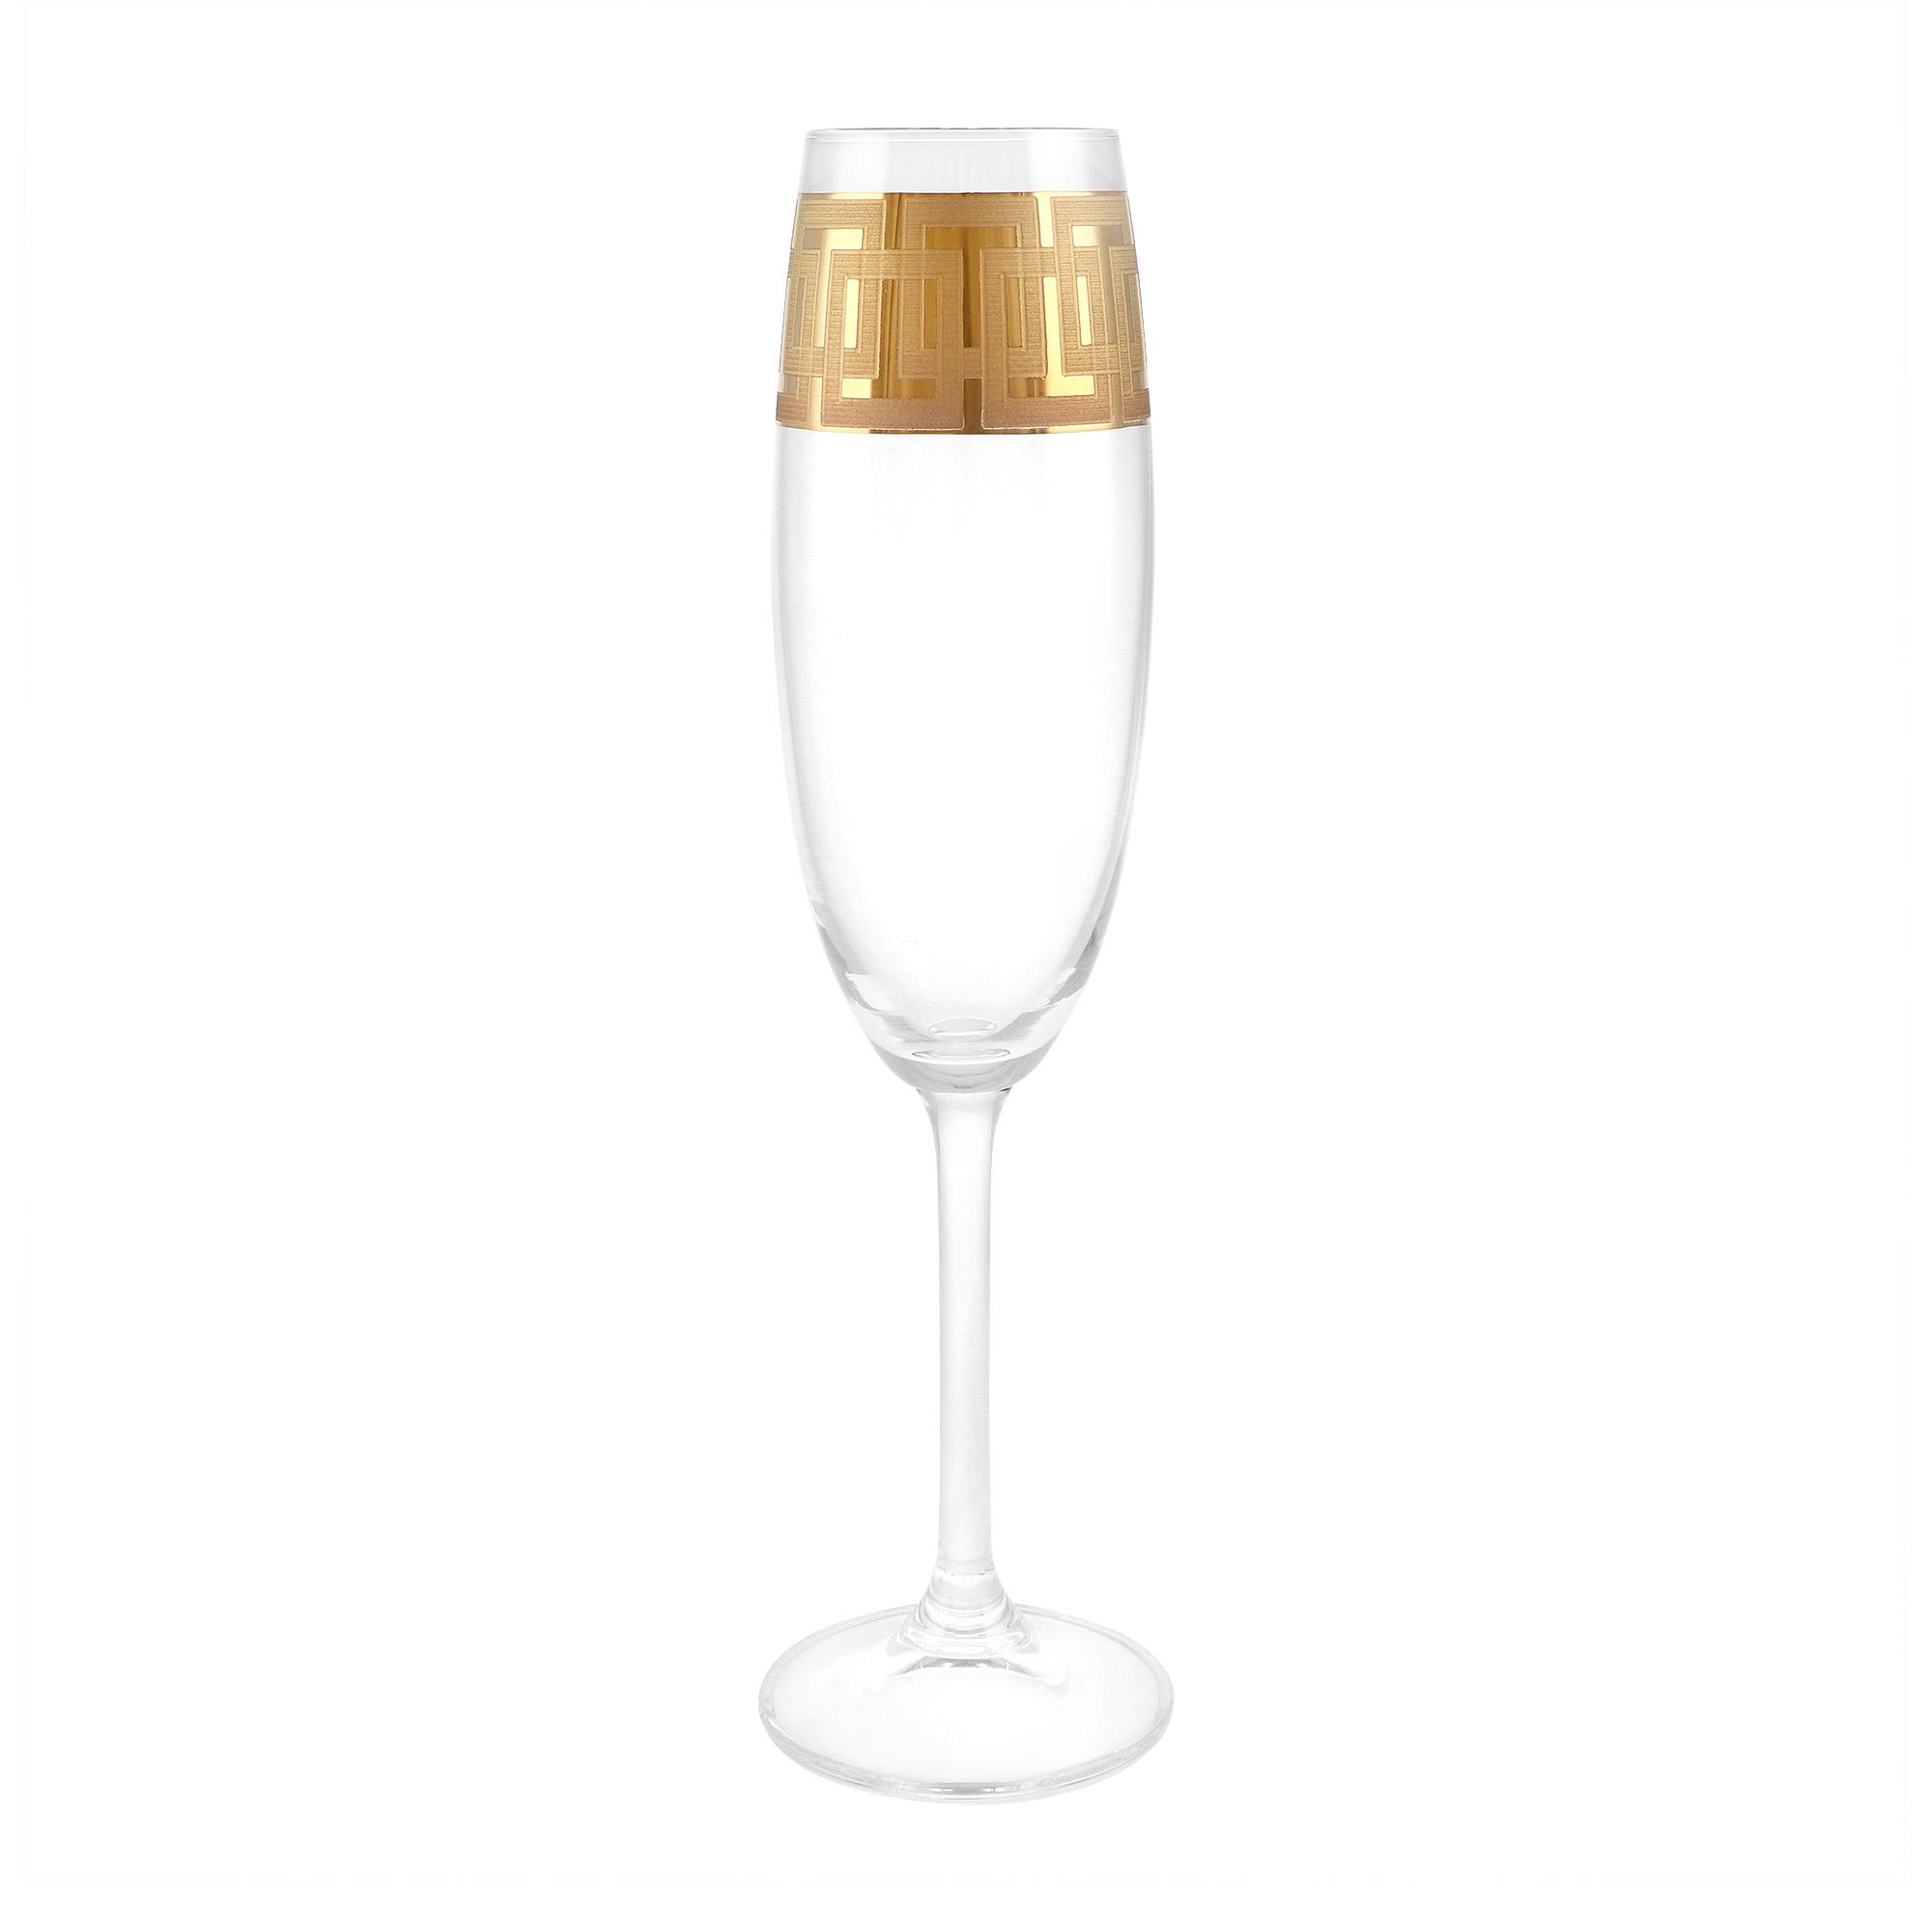 Набор фужеров для шампанского Crystalite bohemia xxl 220 мл 2 шт